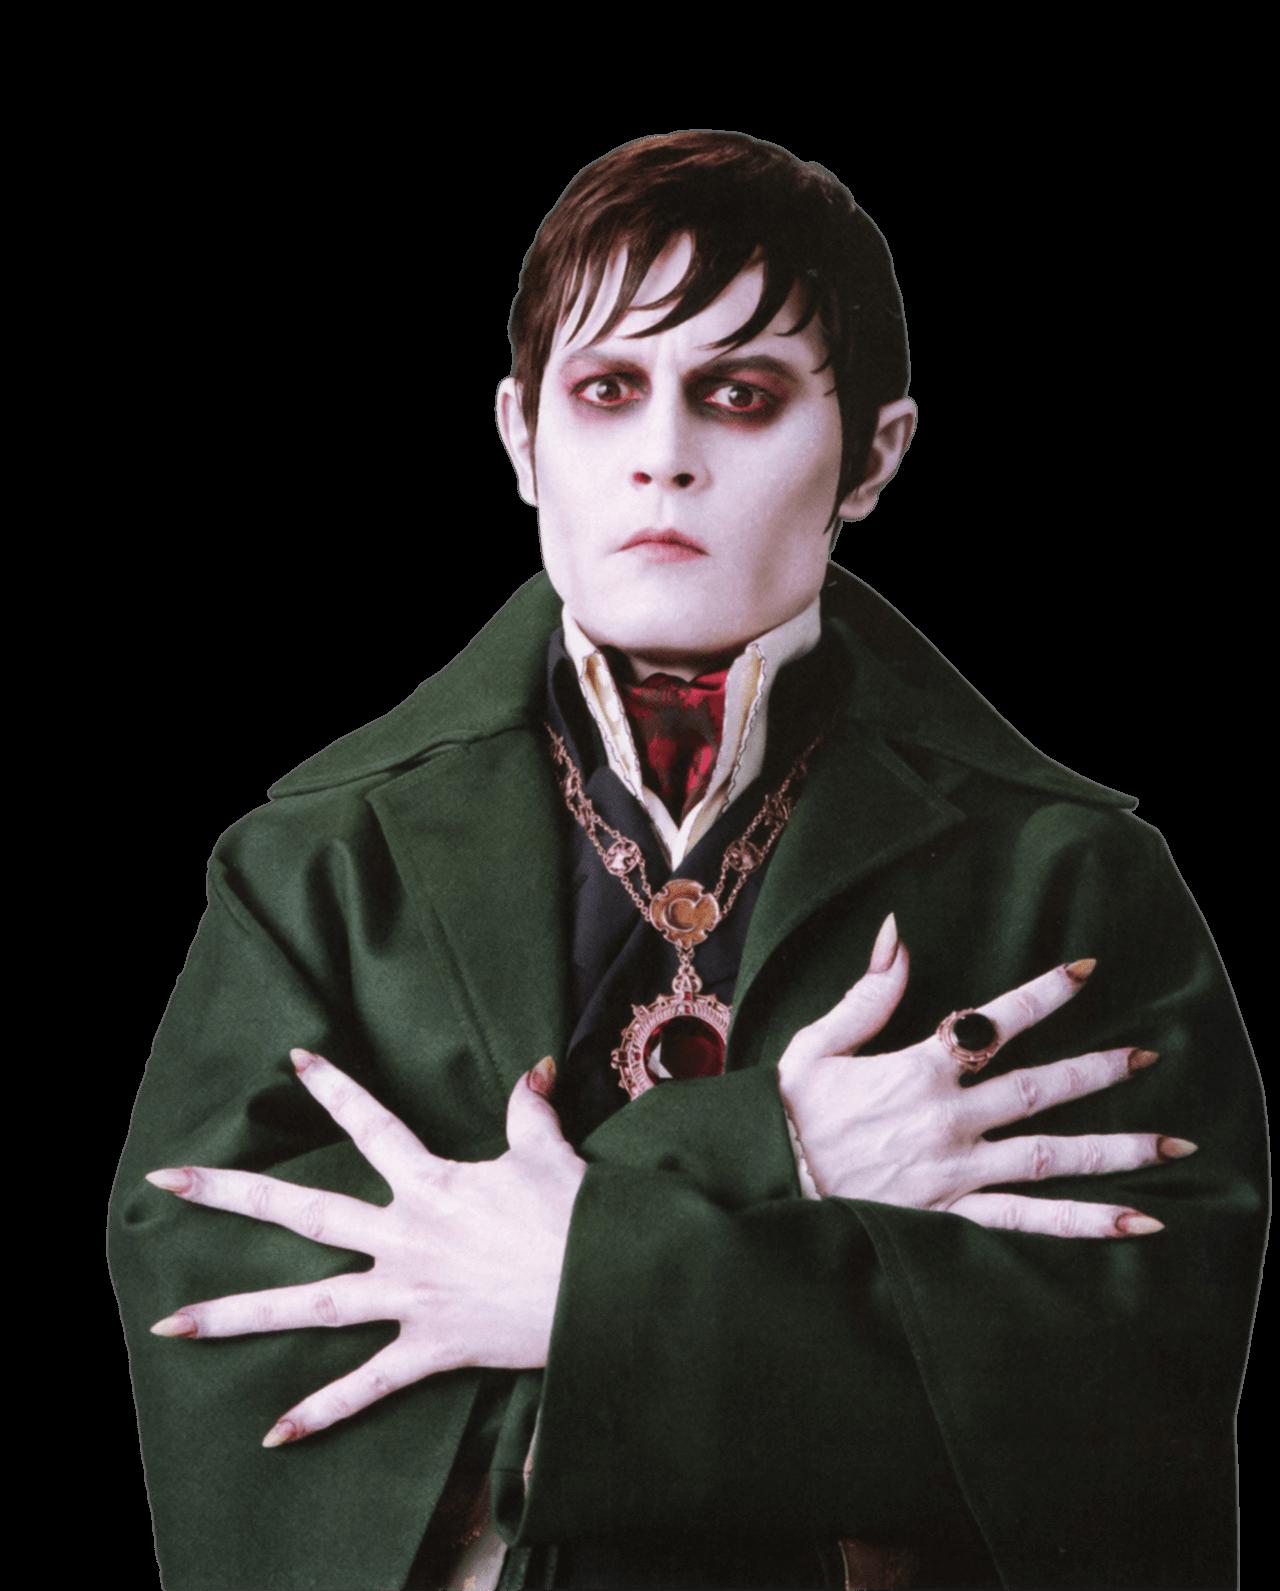 Johnny Depp Scary - Johnny Depp PNG